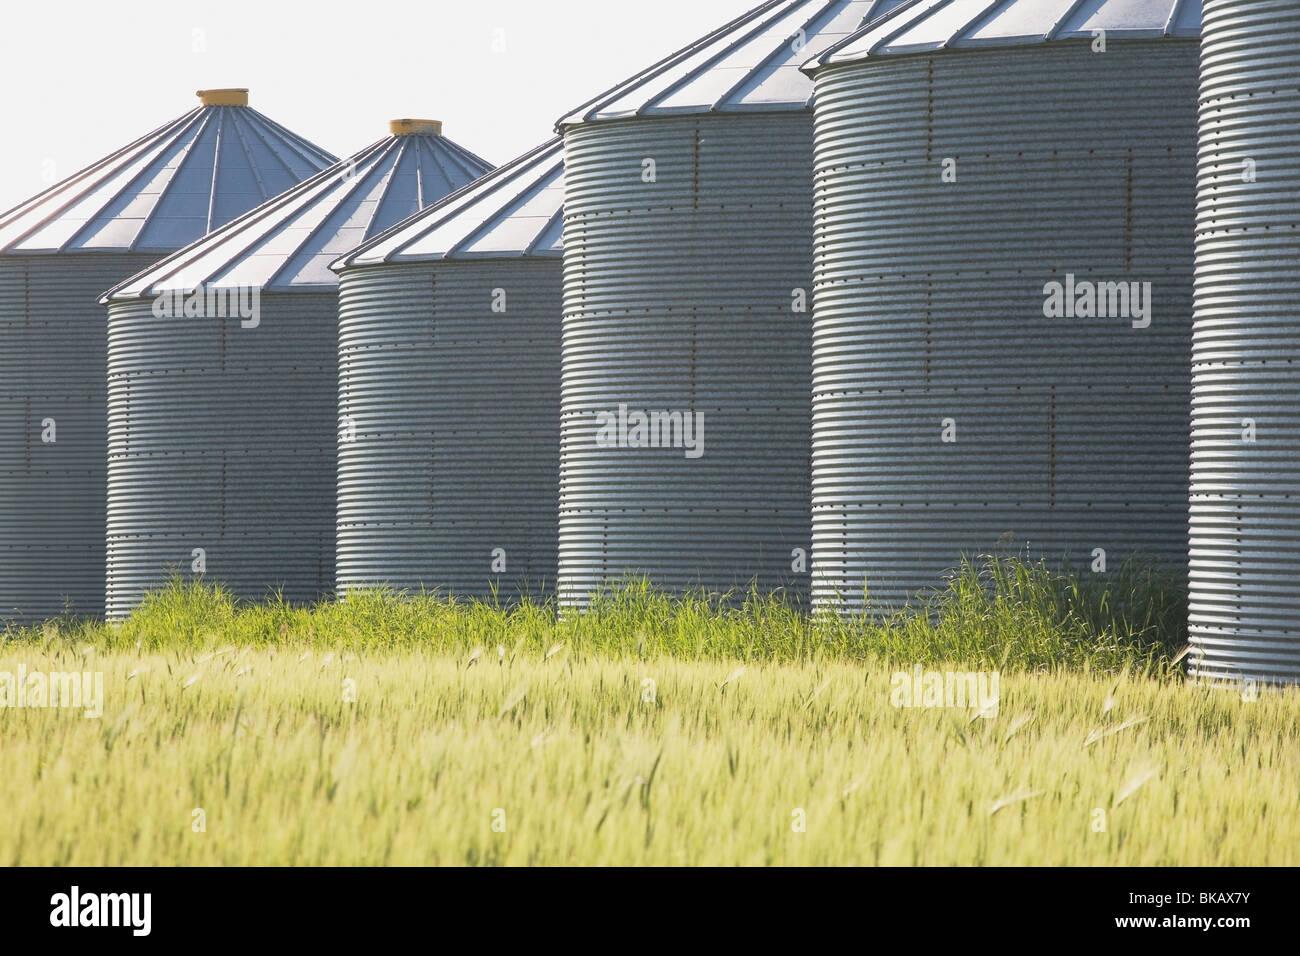 Grain Silos In A Barley Field, West Of Calgary, Alberta, Canada - Stock Image